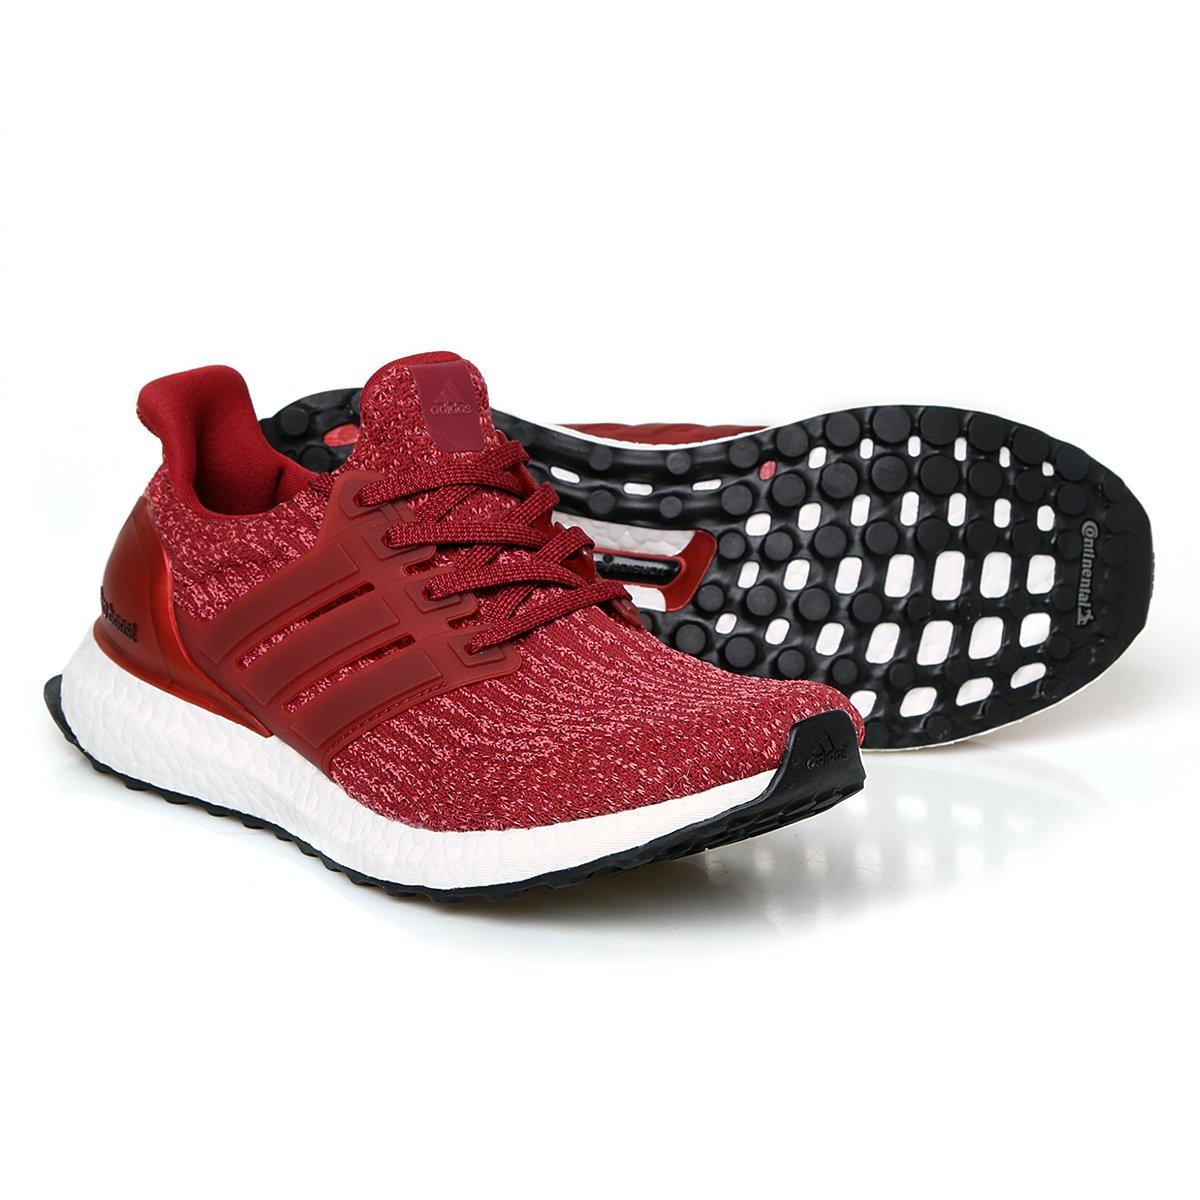 09a93c4c5 Tênis Adidas Ultra Boost Feminino